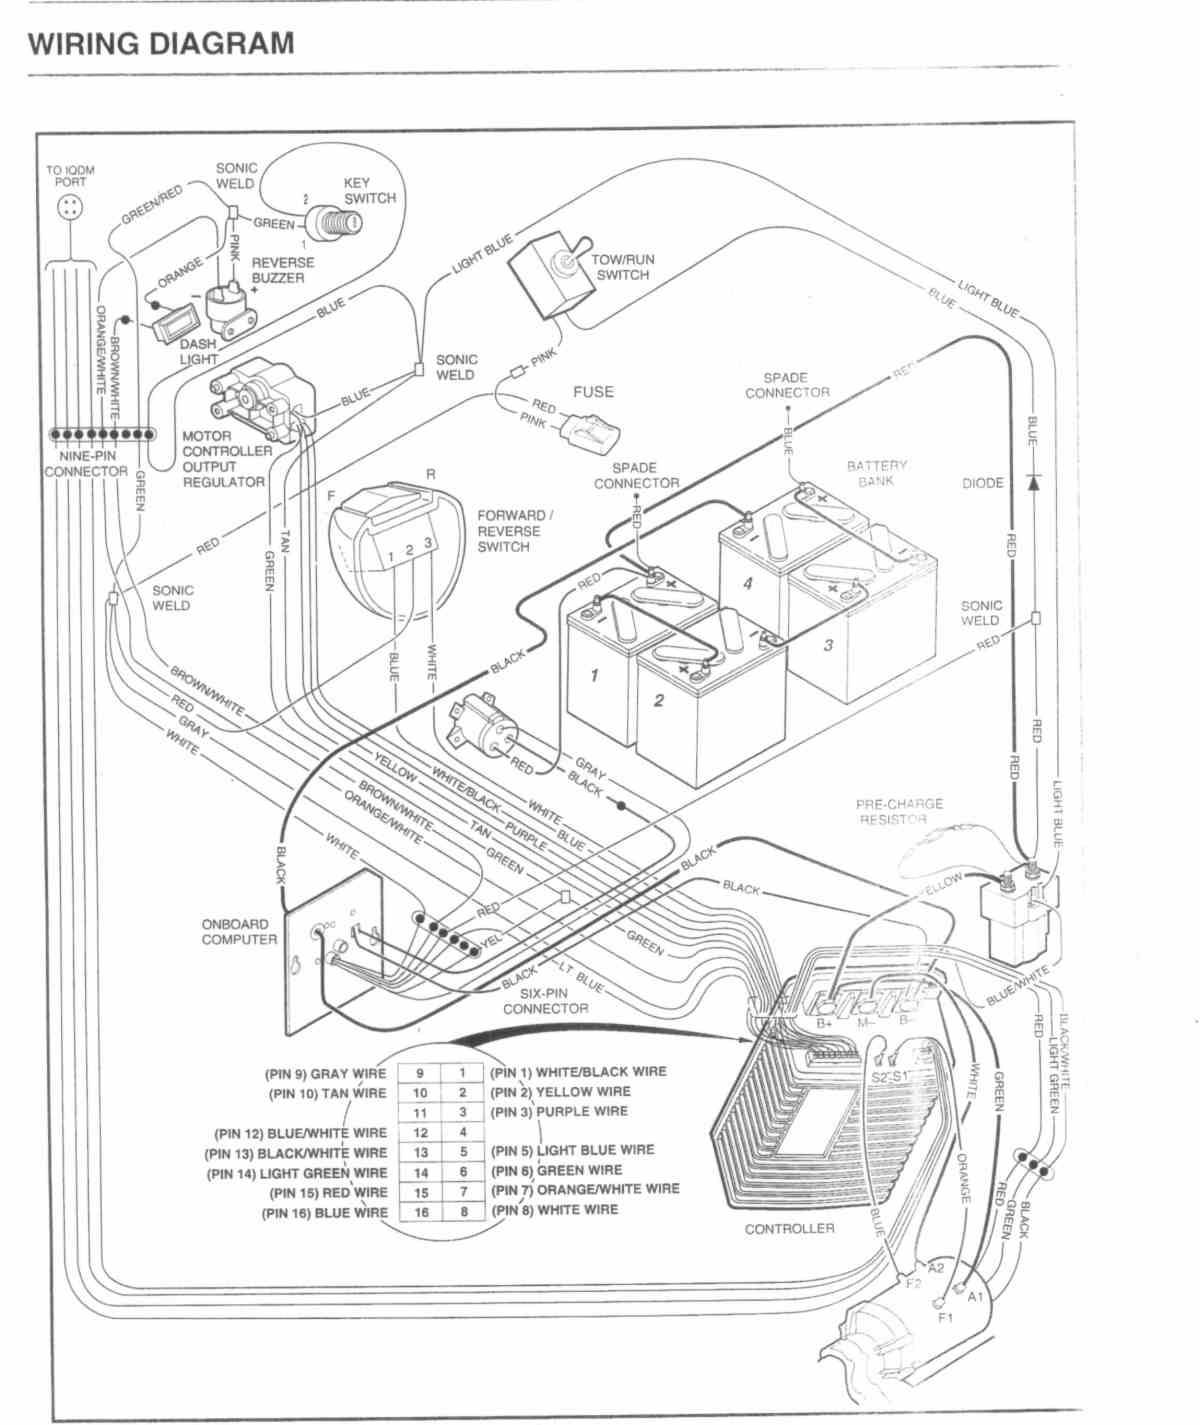 Club Car Precedent Light Kit Wiring Diagram from 2020cadillac.com